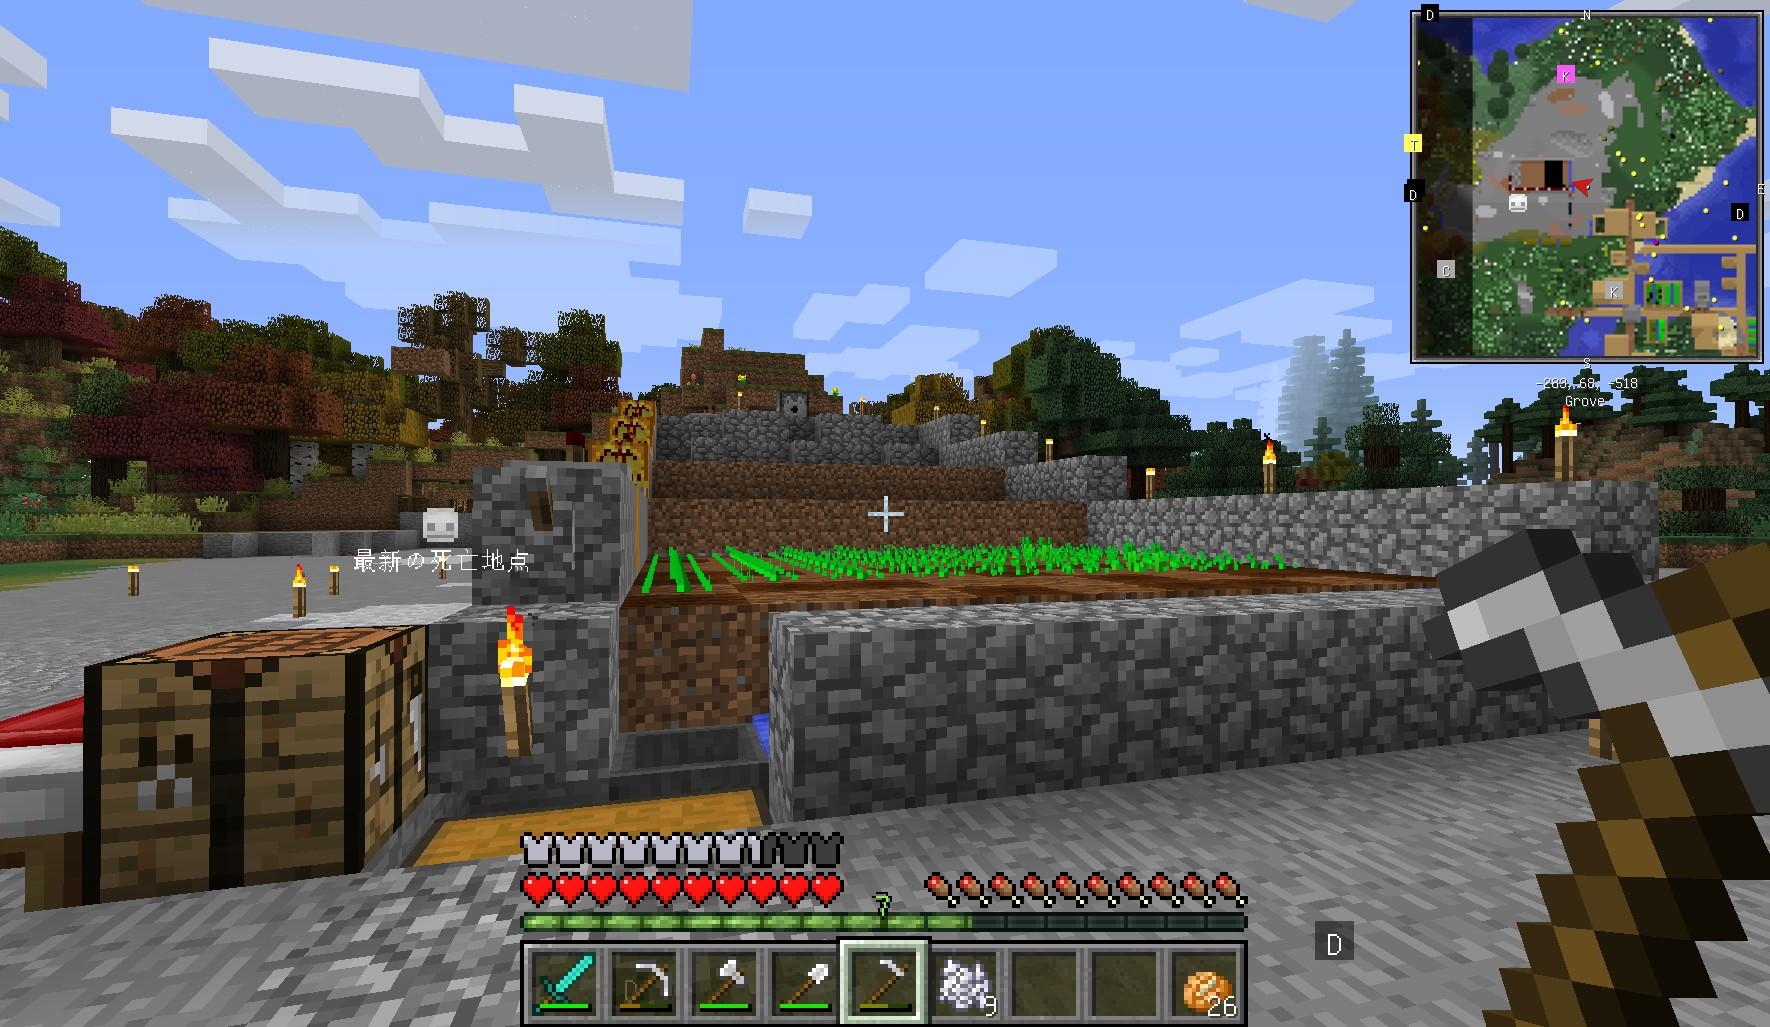 minecraft_058.jpg